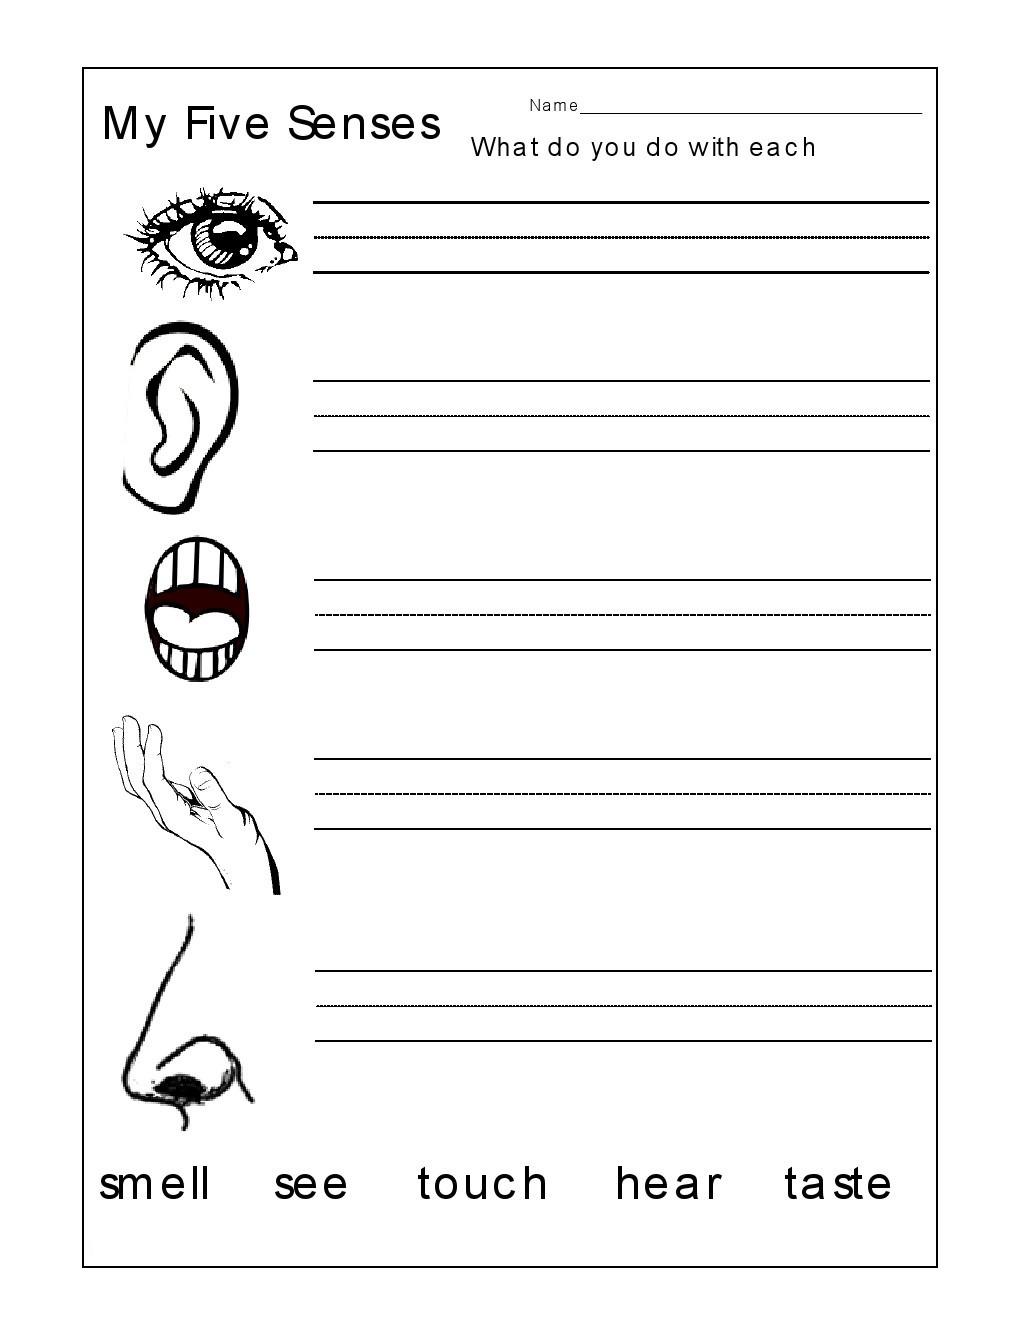 5 Senses Printable Worksheets Kindergarten Worksheets Kindergarten Worksheets the 5